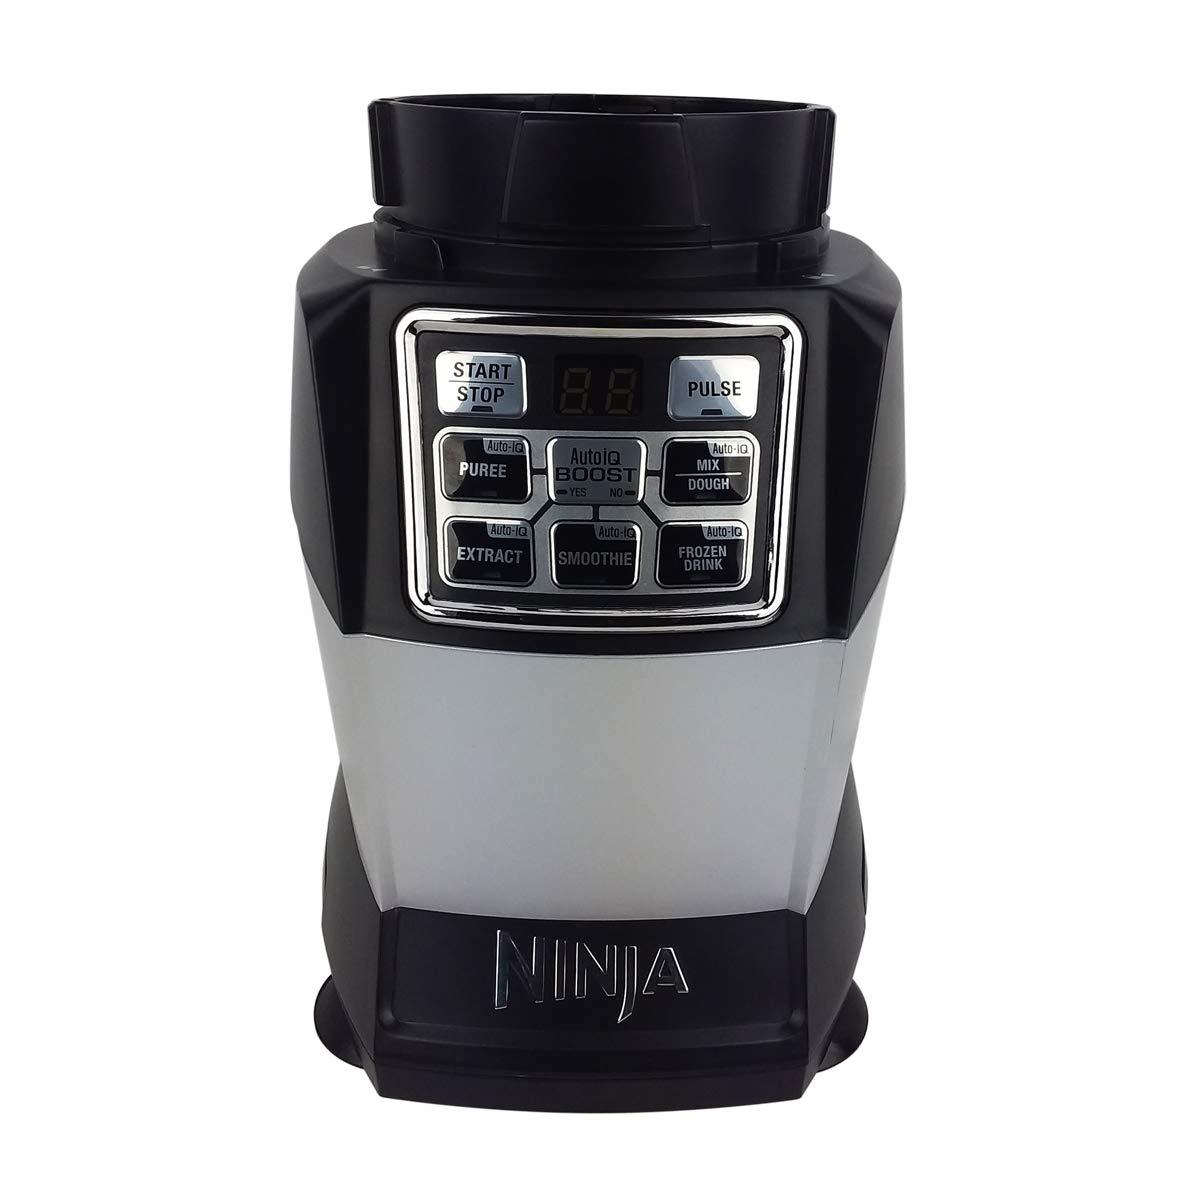 Original Ninja Kitchen System with Auto-iQ Boost Power Base Blender BL494 1200 Watt 7 Fin Gear For 24oz BPA Free Tritan Cup 72oz Pitcher Dough Blade Home Appliance (Certified Refurbished)